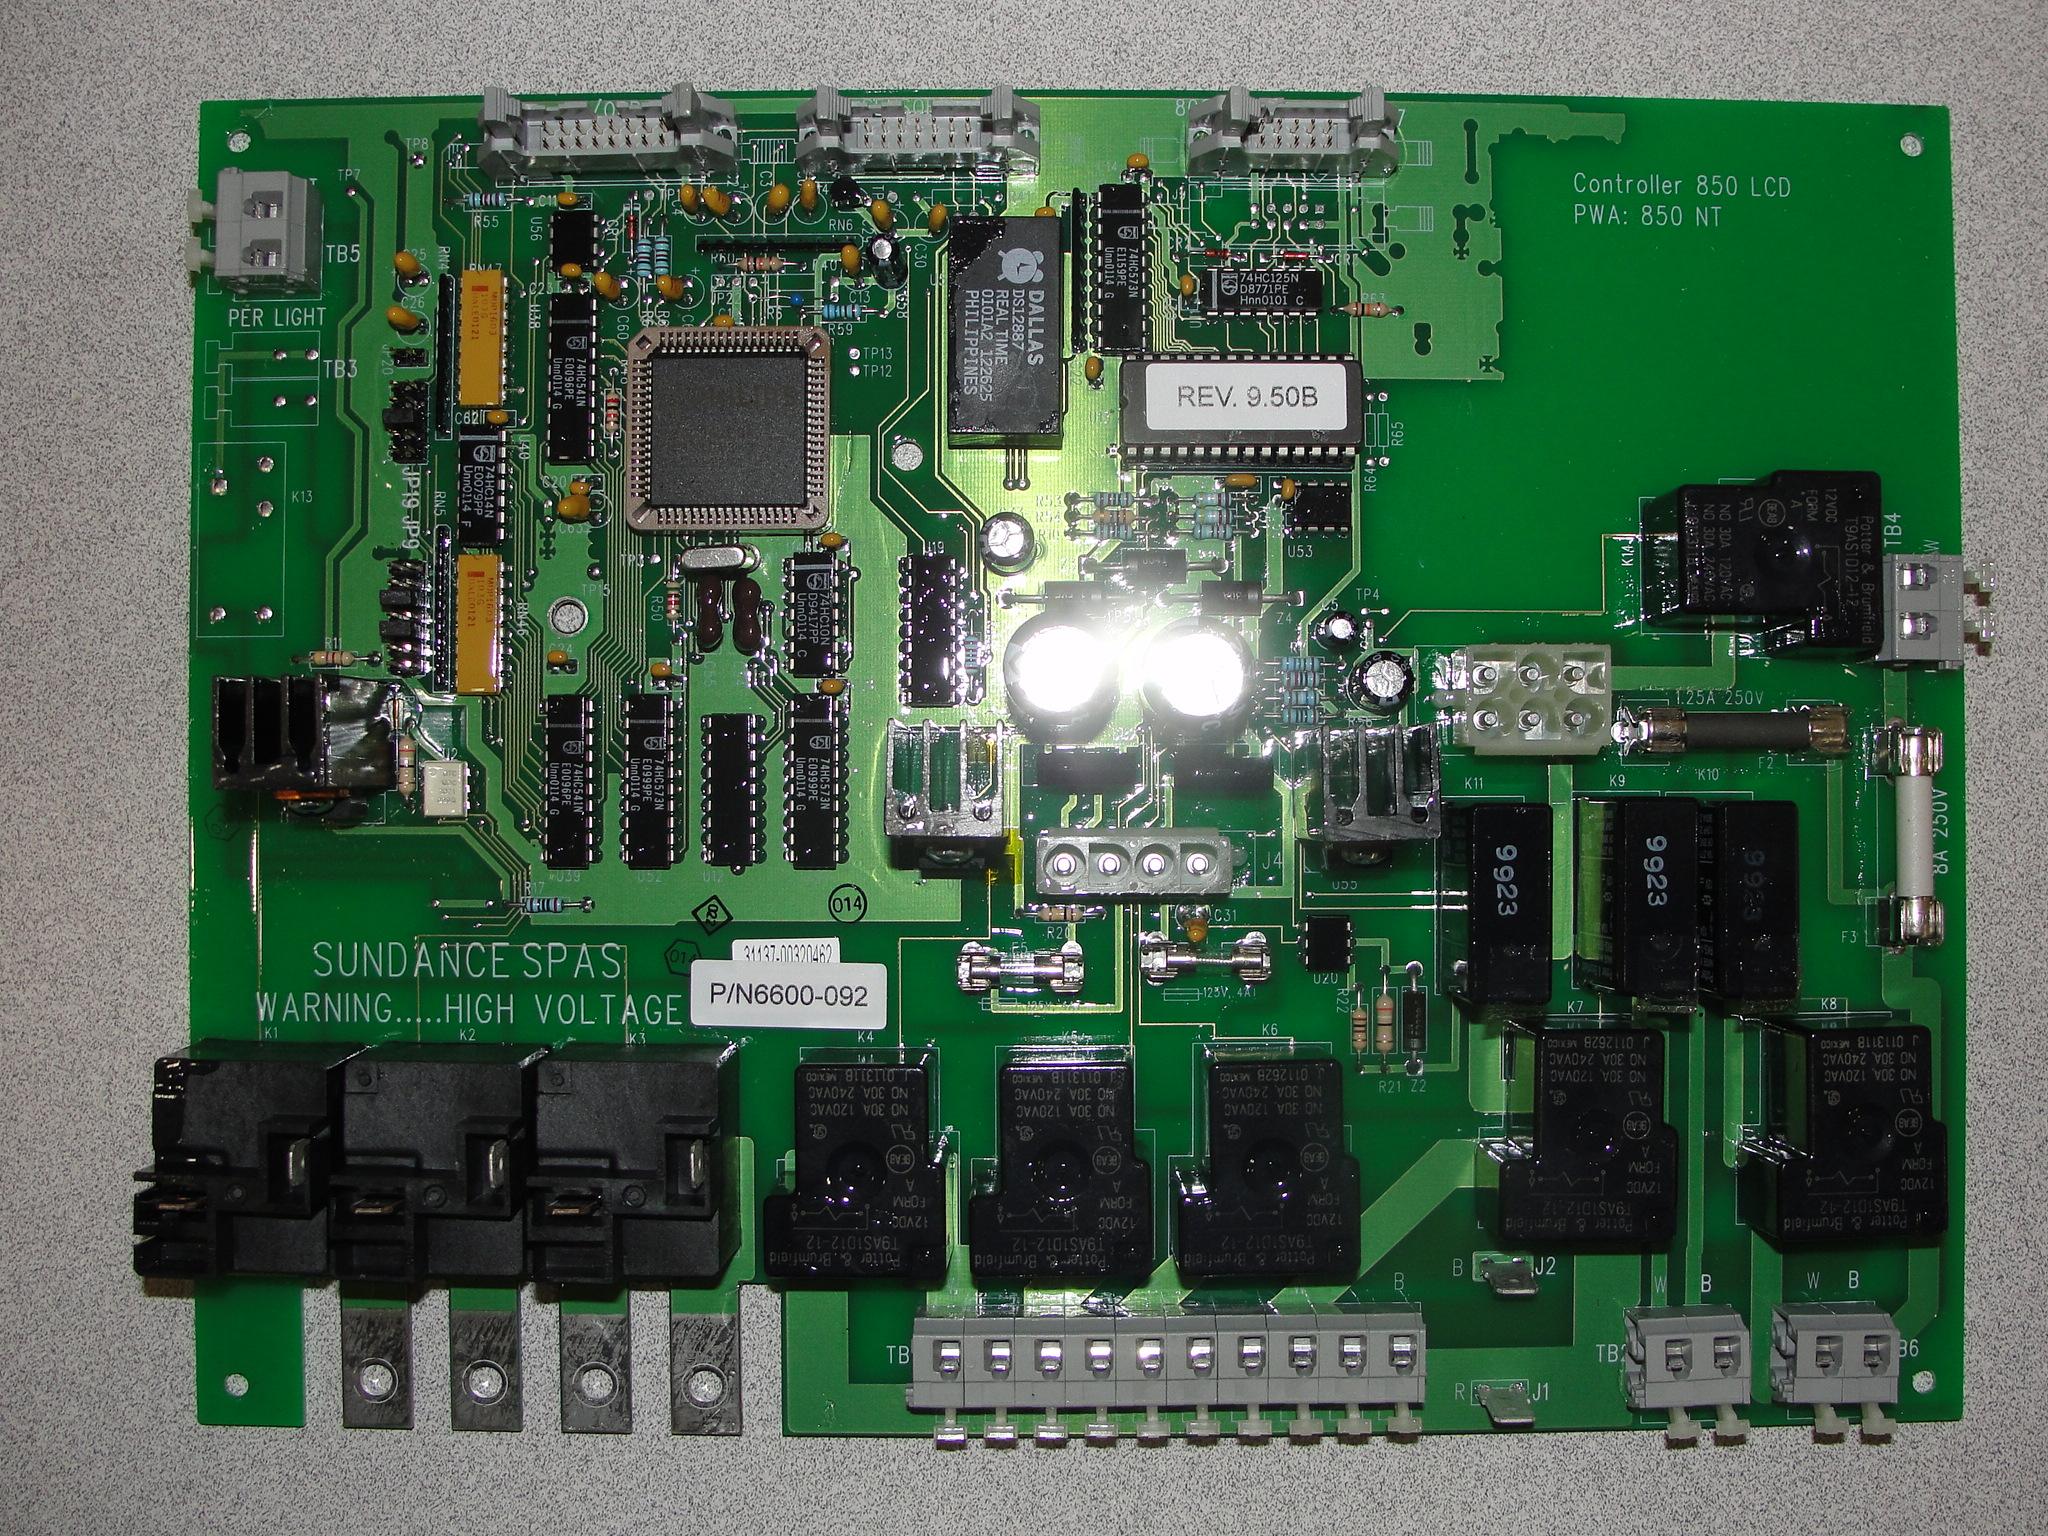 hight resolution of sundance spa jacuzzi spa circuit board 6600 092 a 1 spa control rh a1spacontrol com circuit